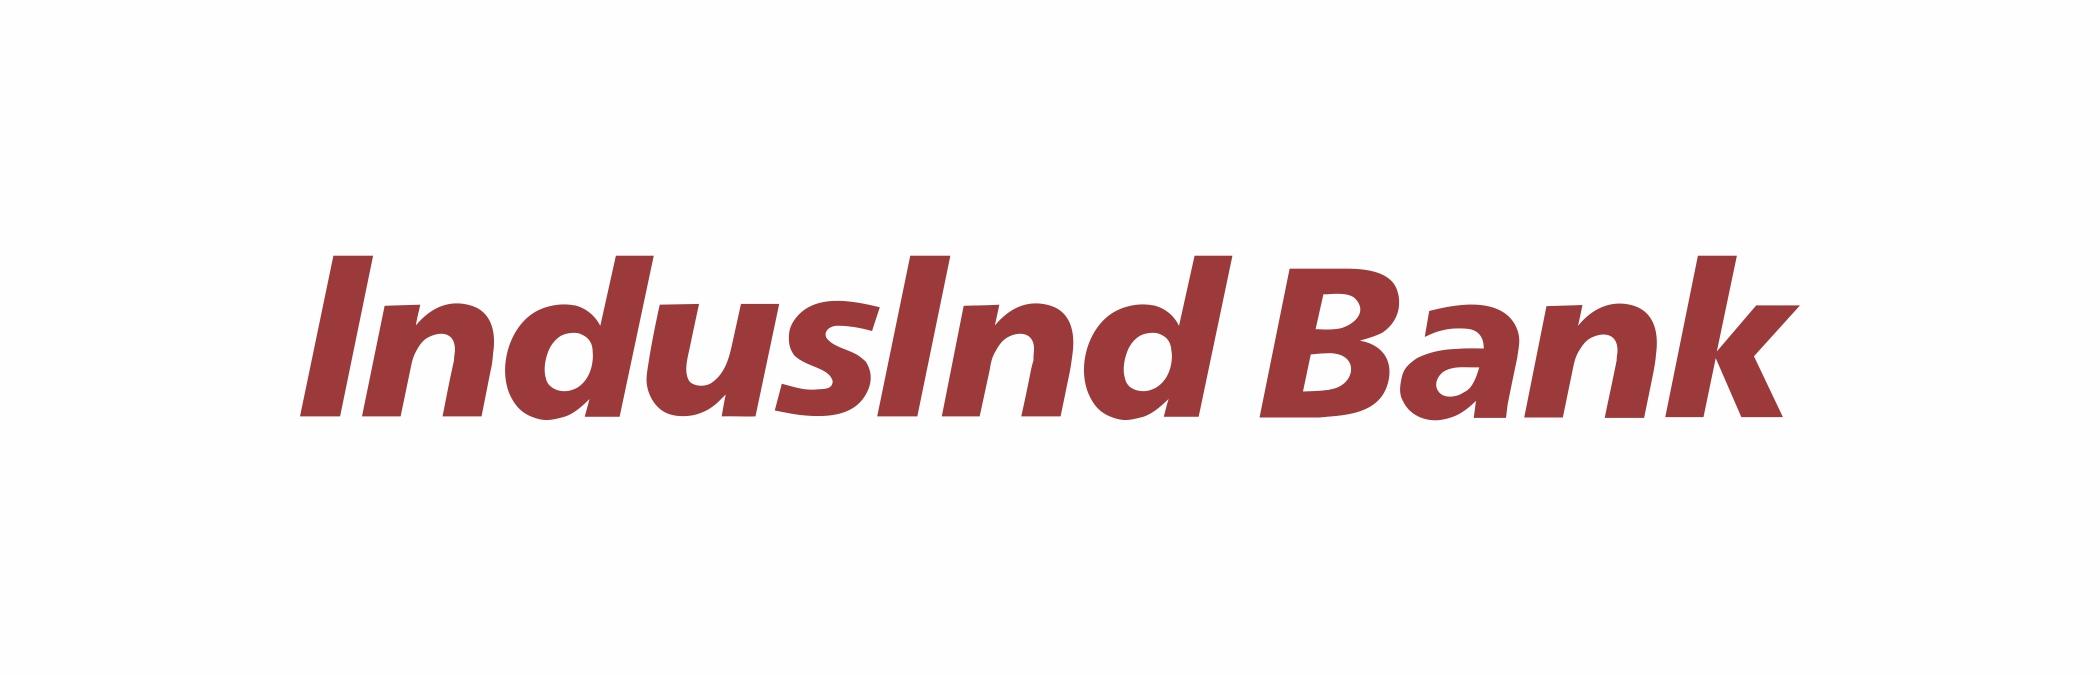 IndusInd Bank,M G Road Bengaluru